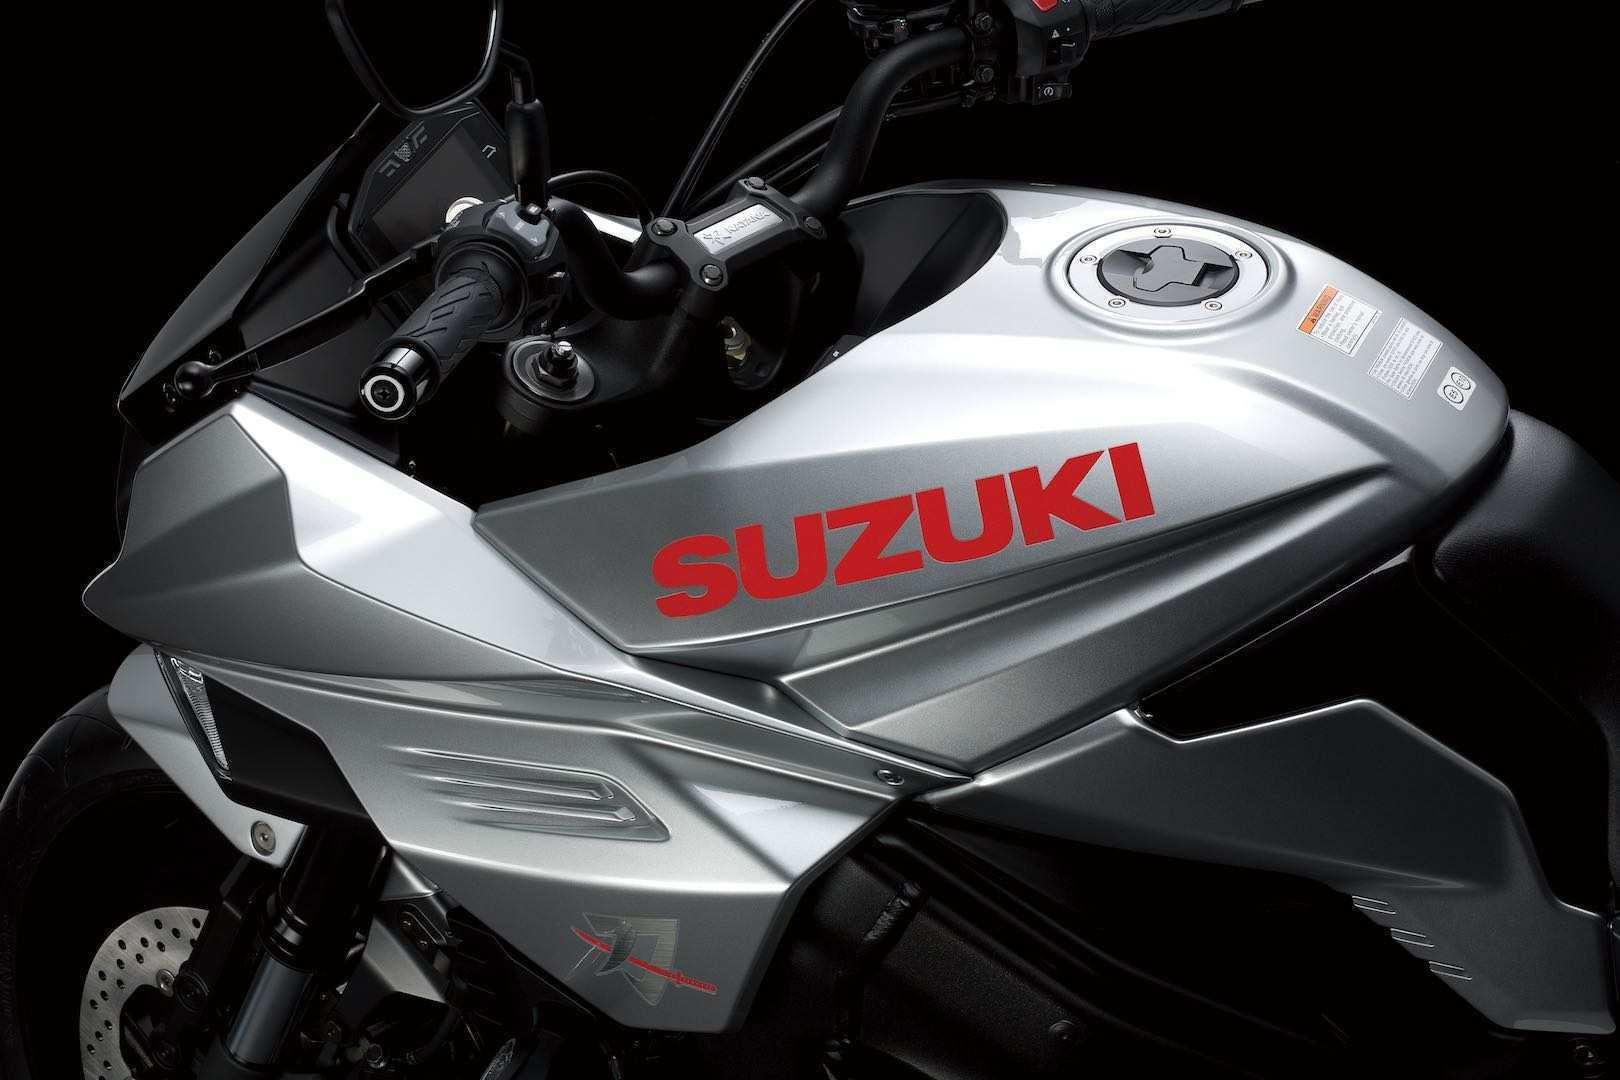 89 Concept of Motor Suzuki 2020 Images for Motor Suzuki 2020